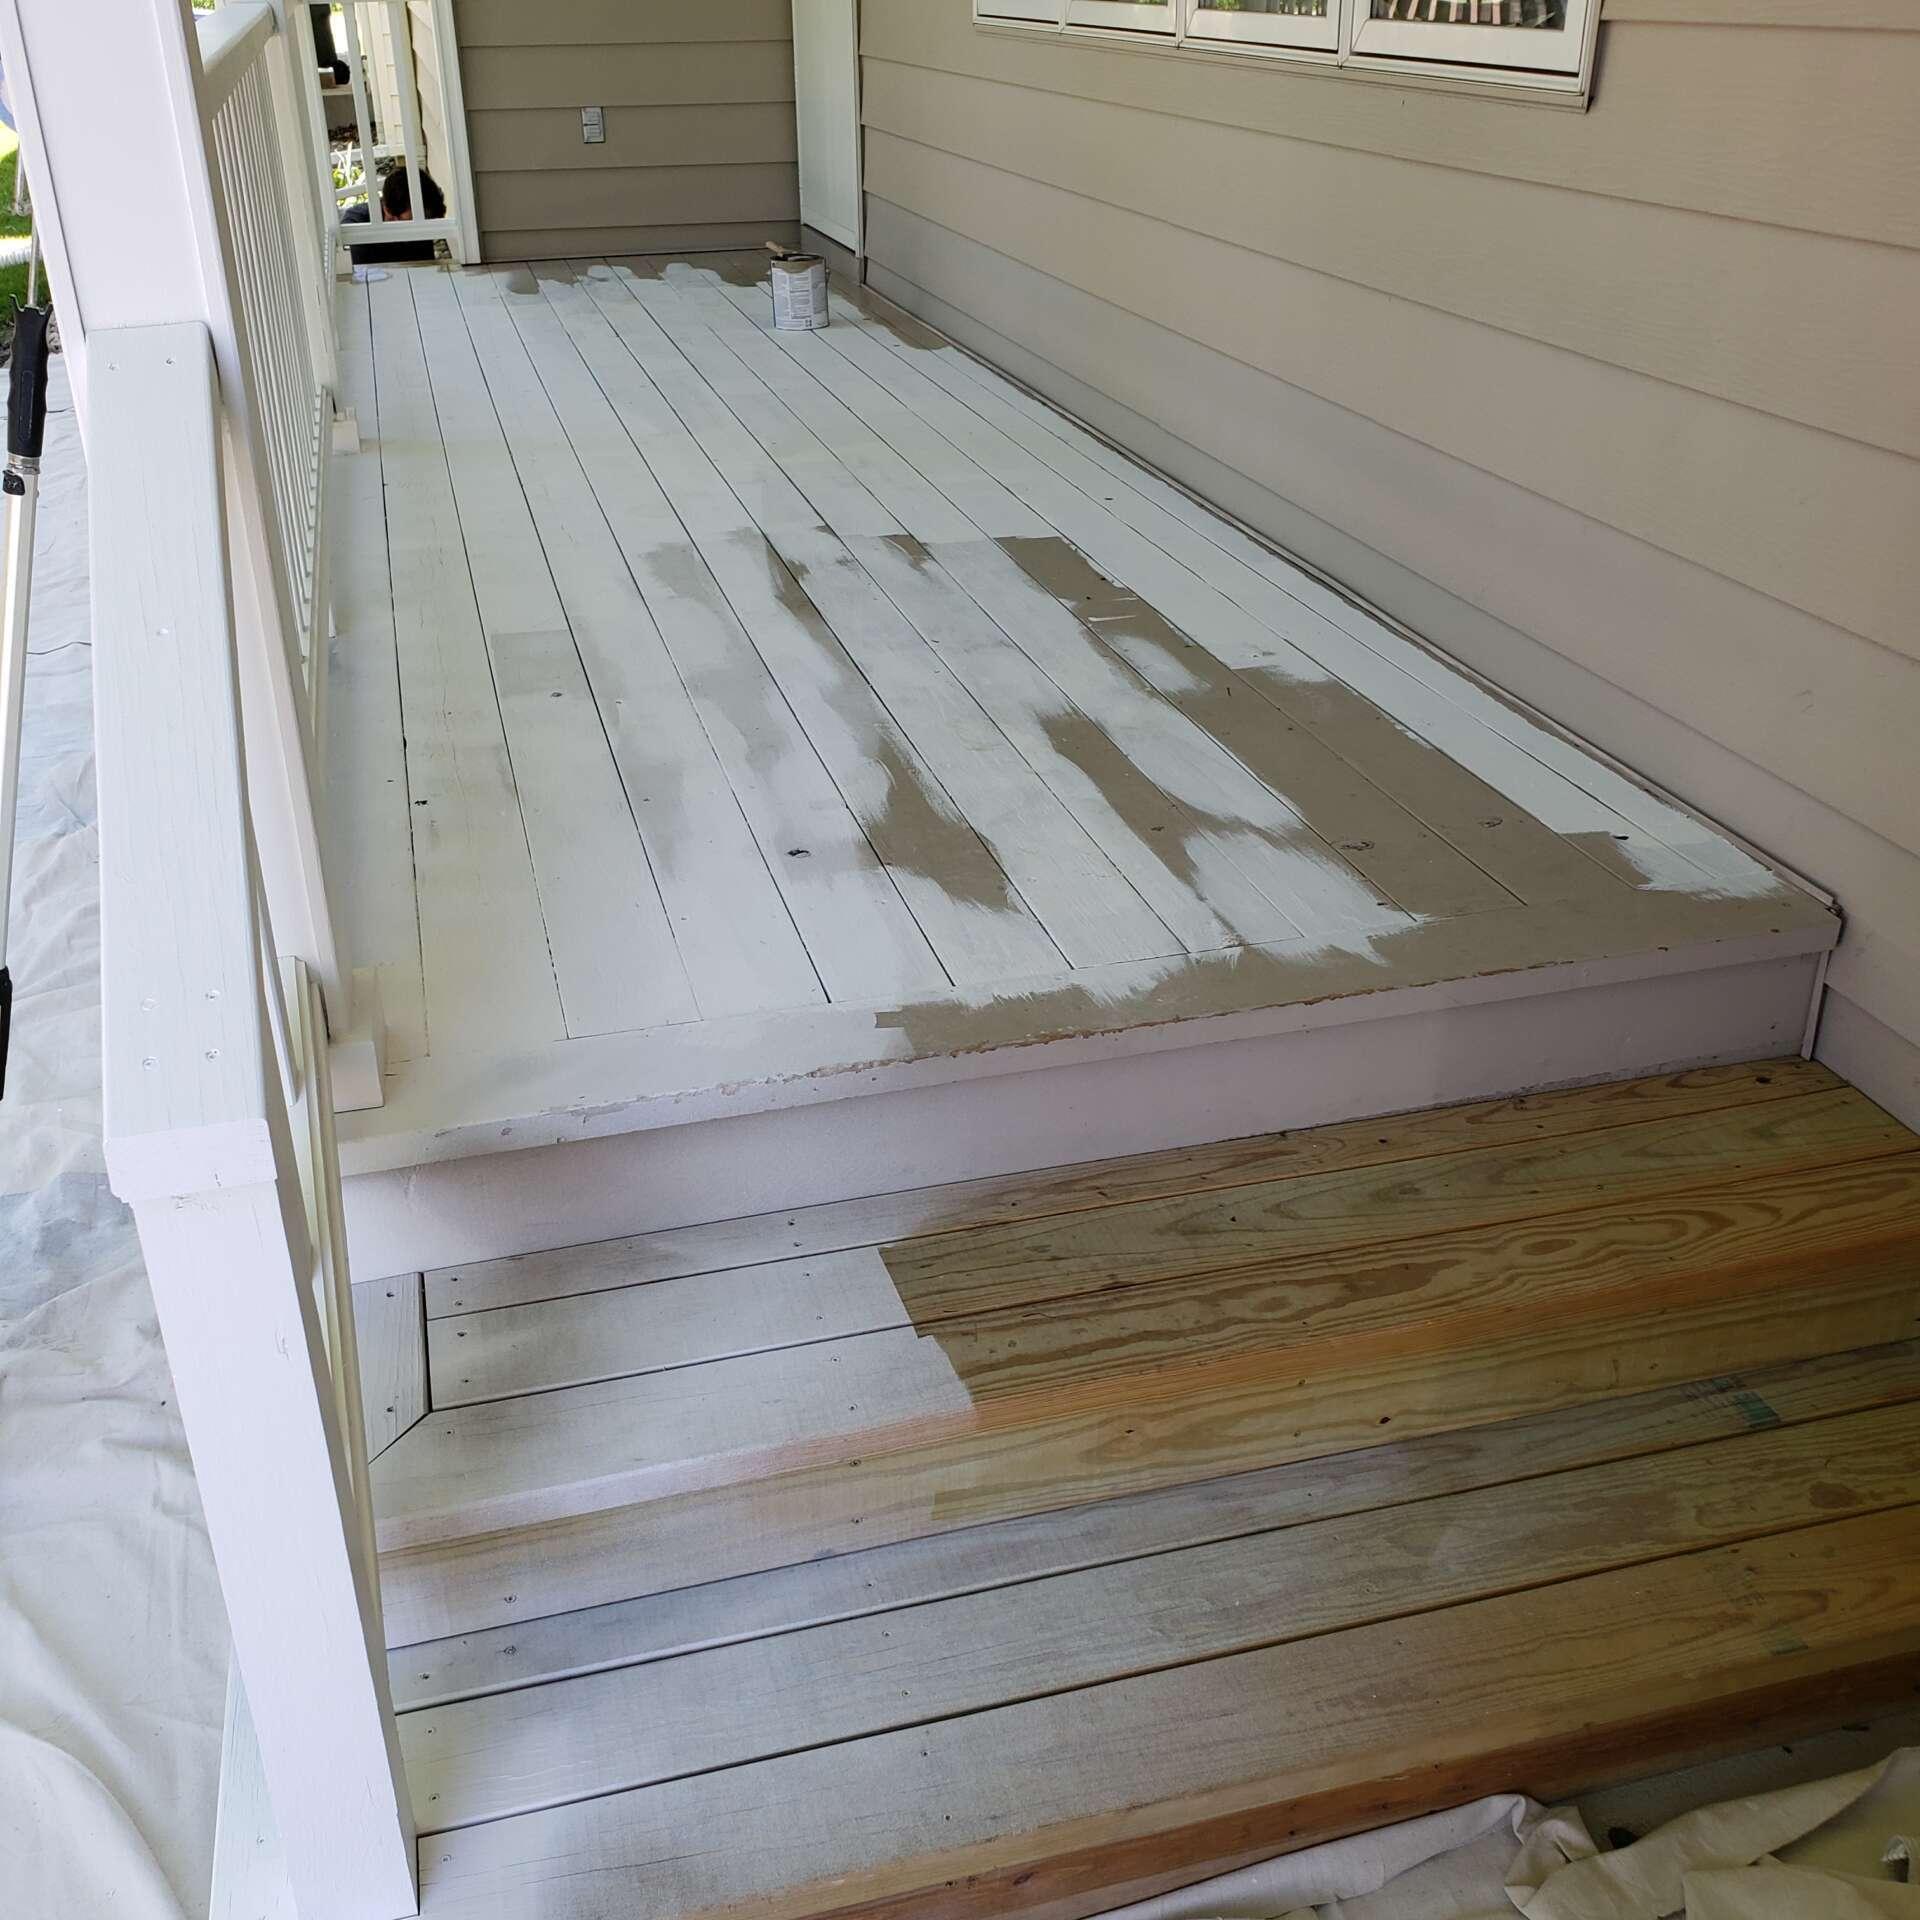 During Exterior Porch Paint